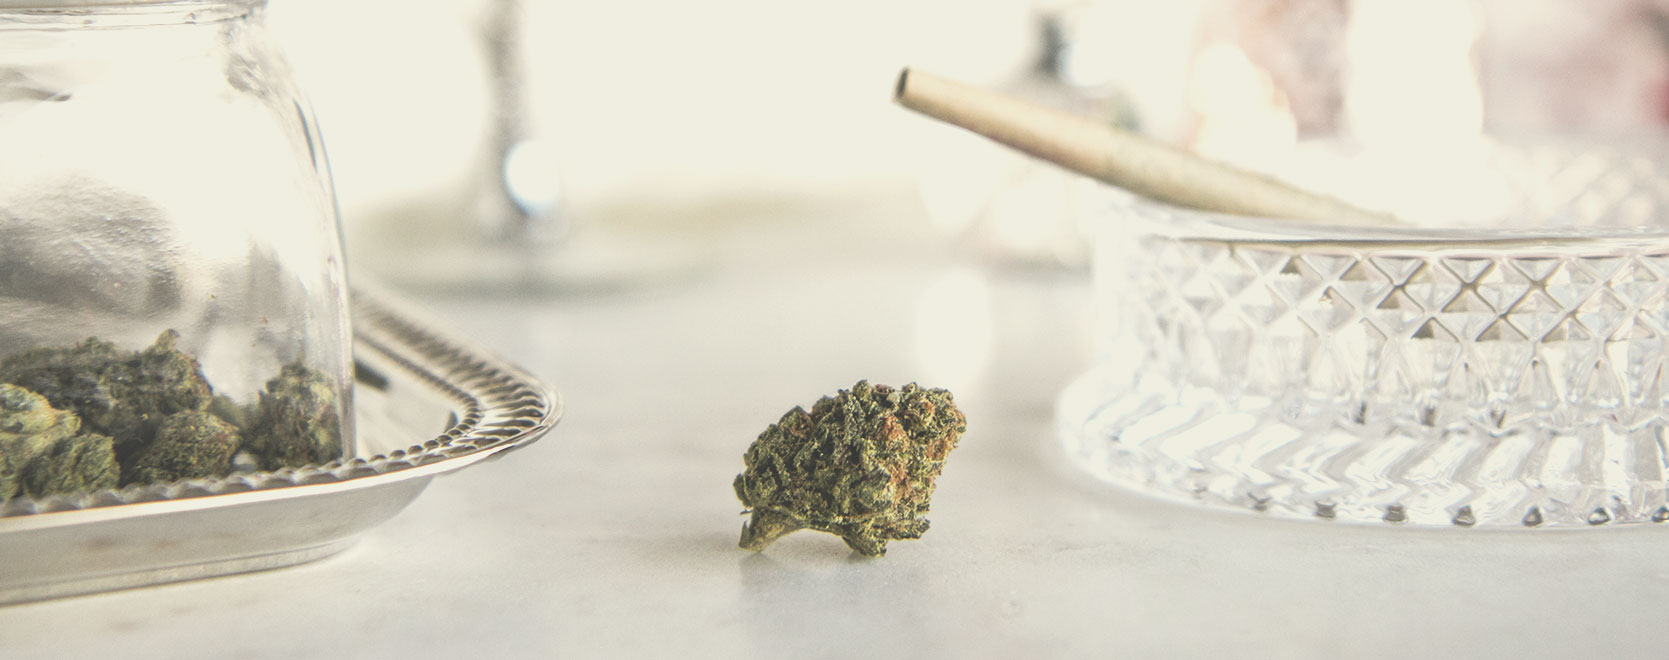 Cómo consumir marihuana de forma responsable